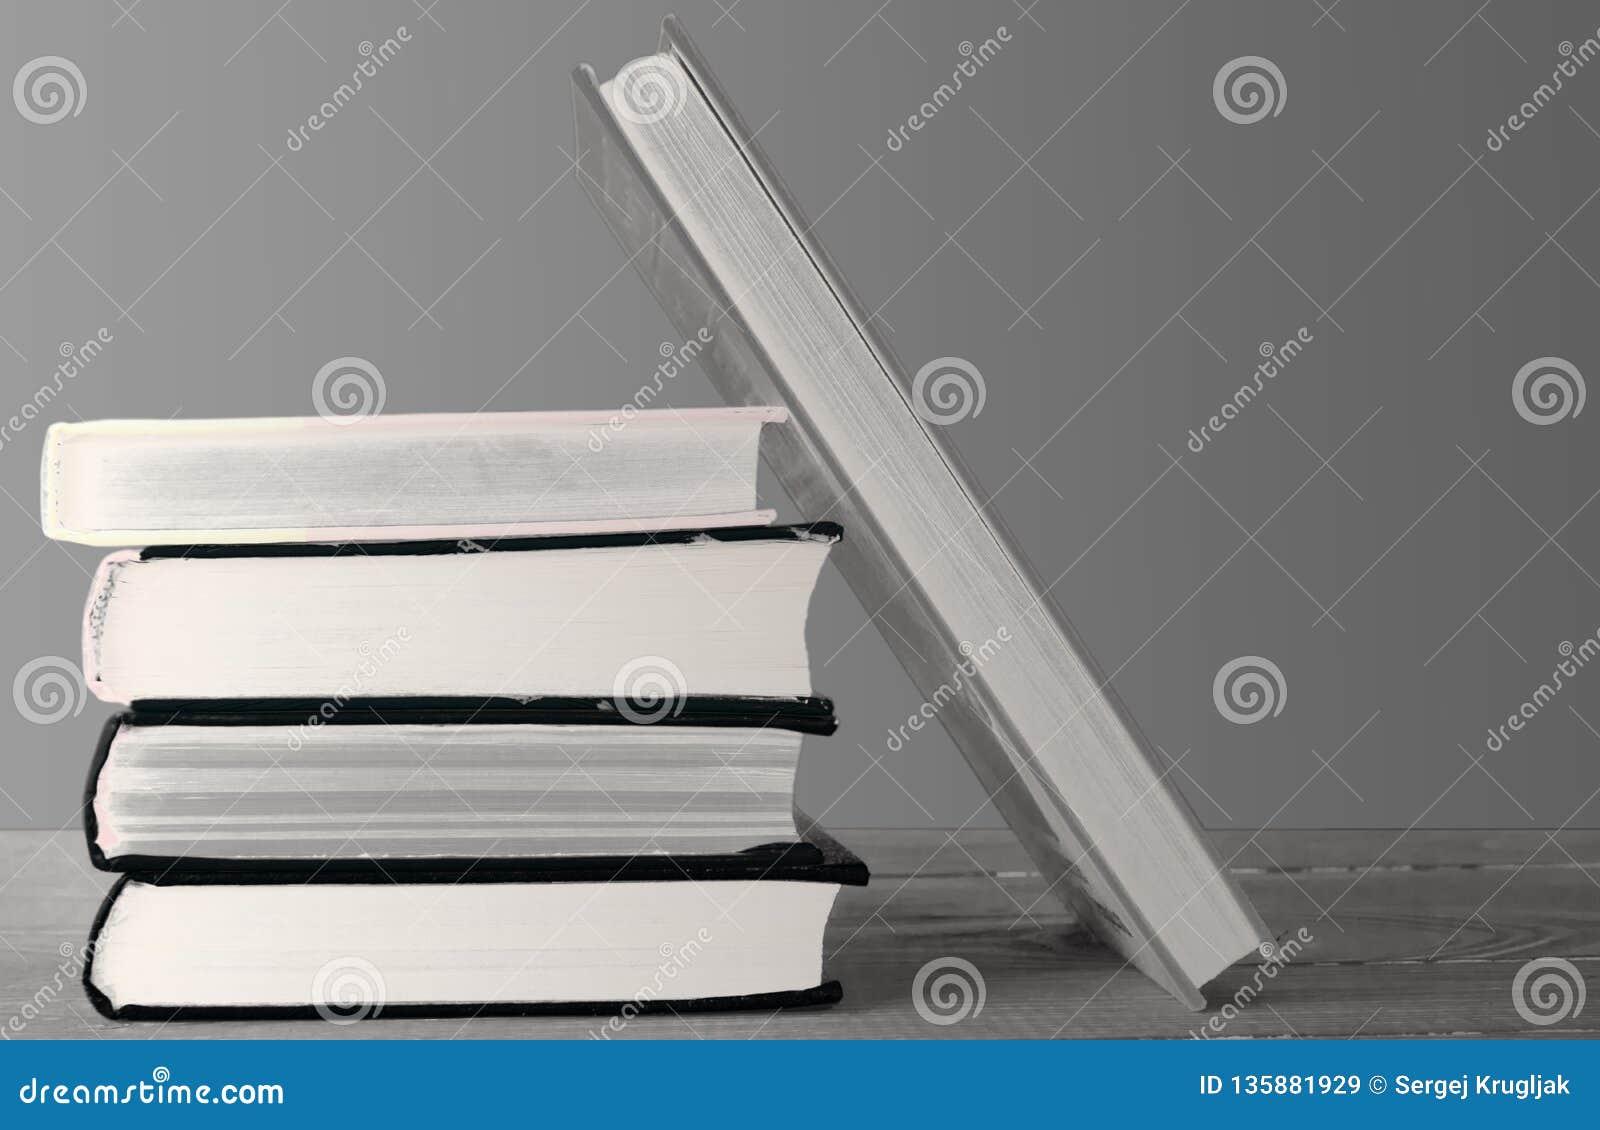 Boeken bovenop elkaar worden gestapeld die